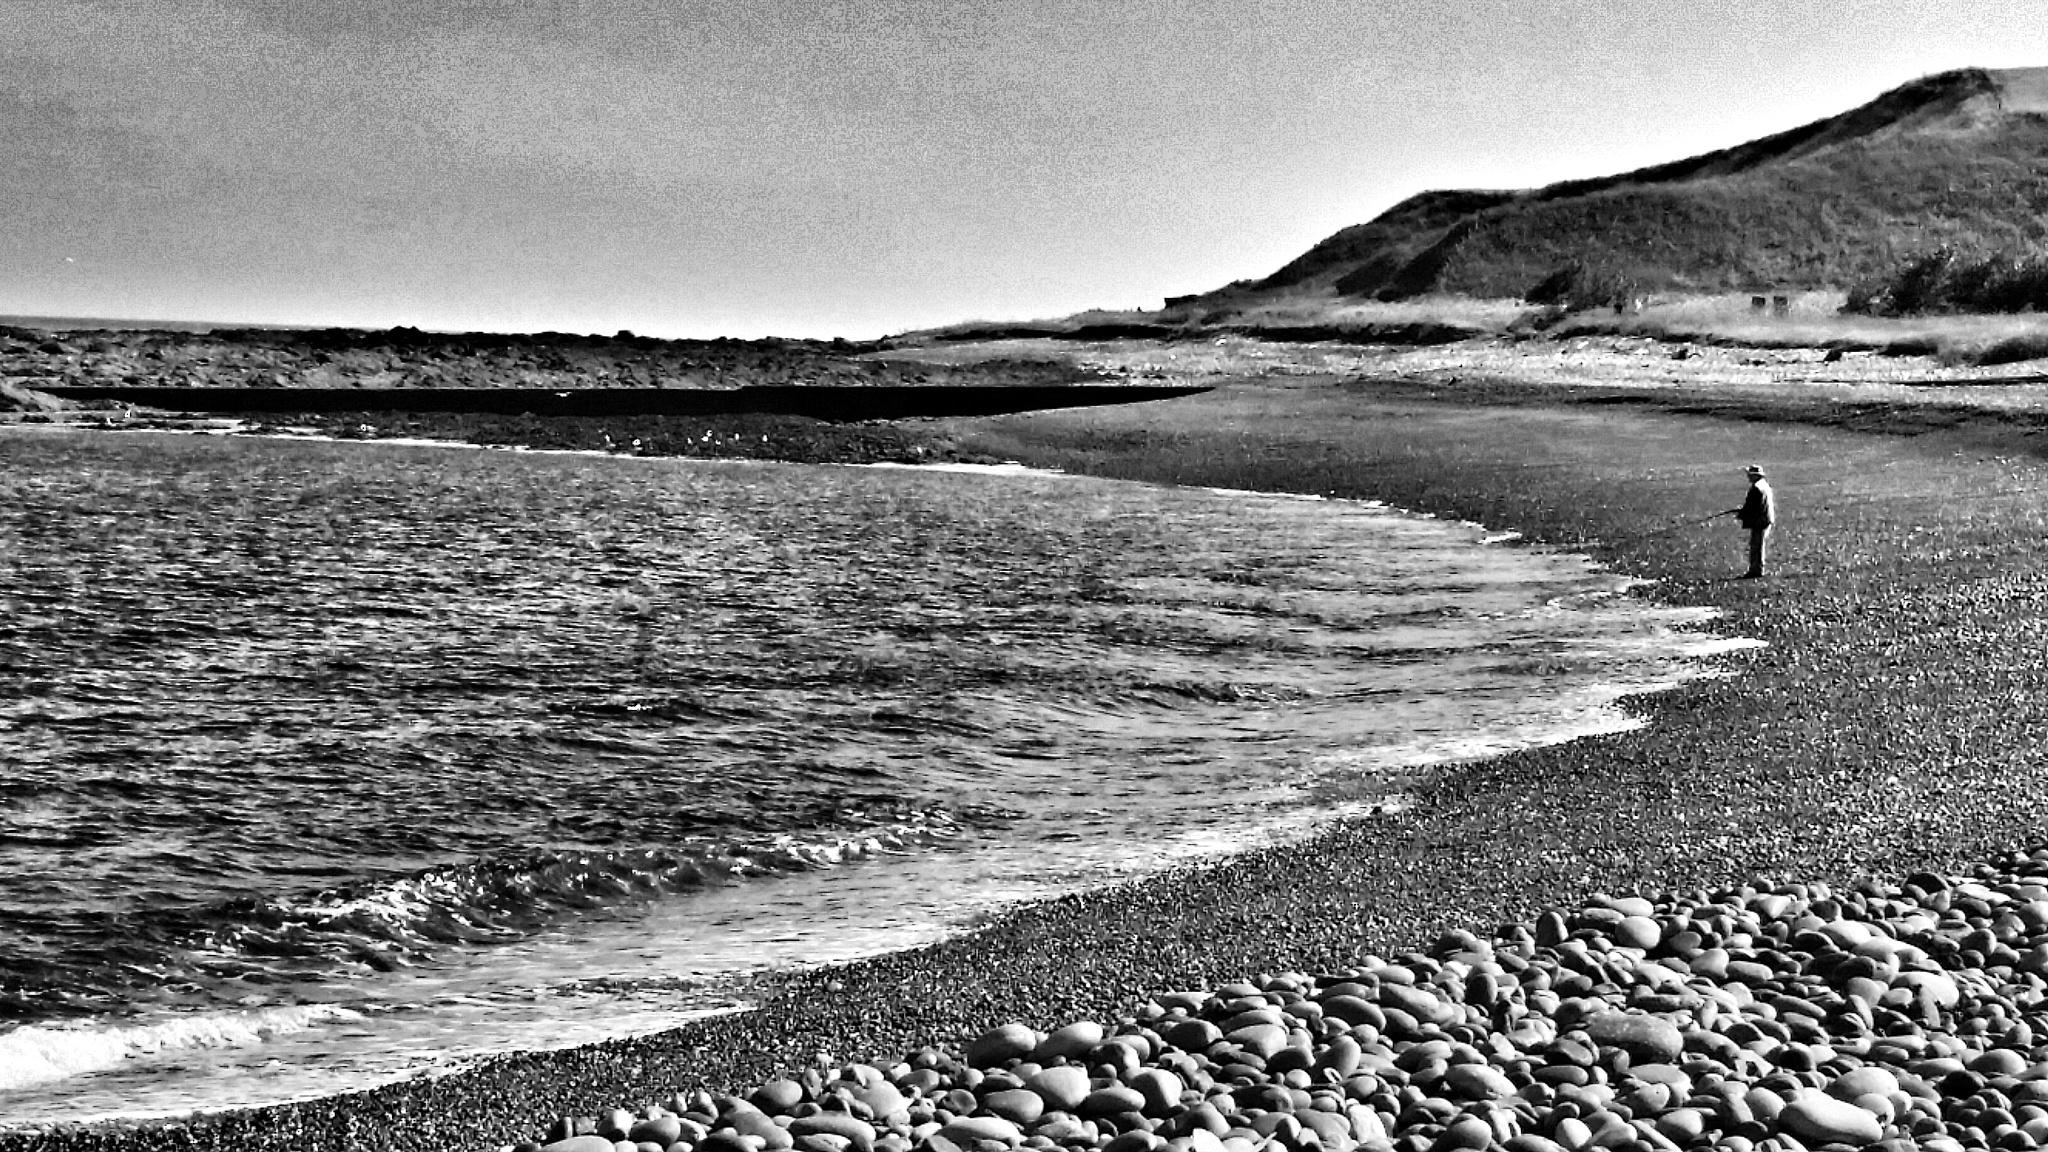 Inverbervie beach by PaulAnderson